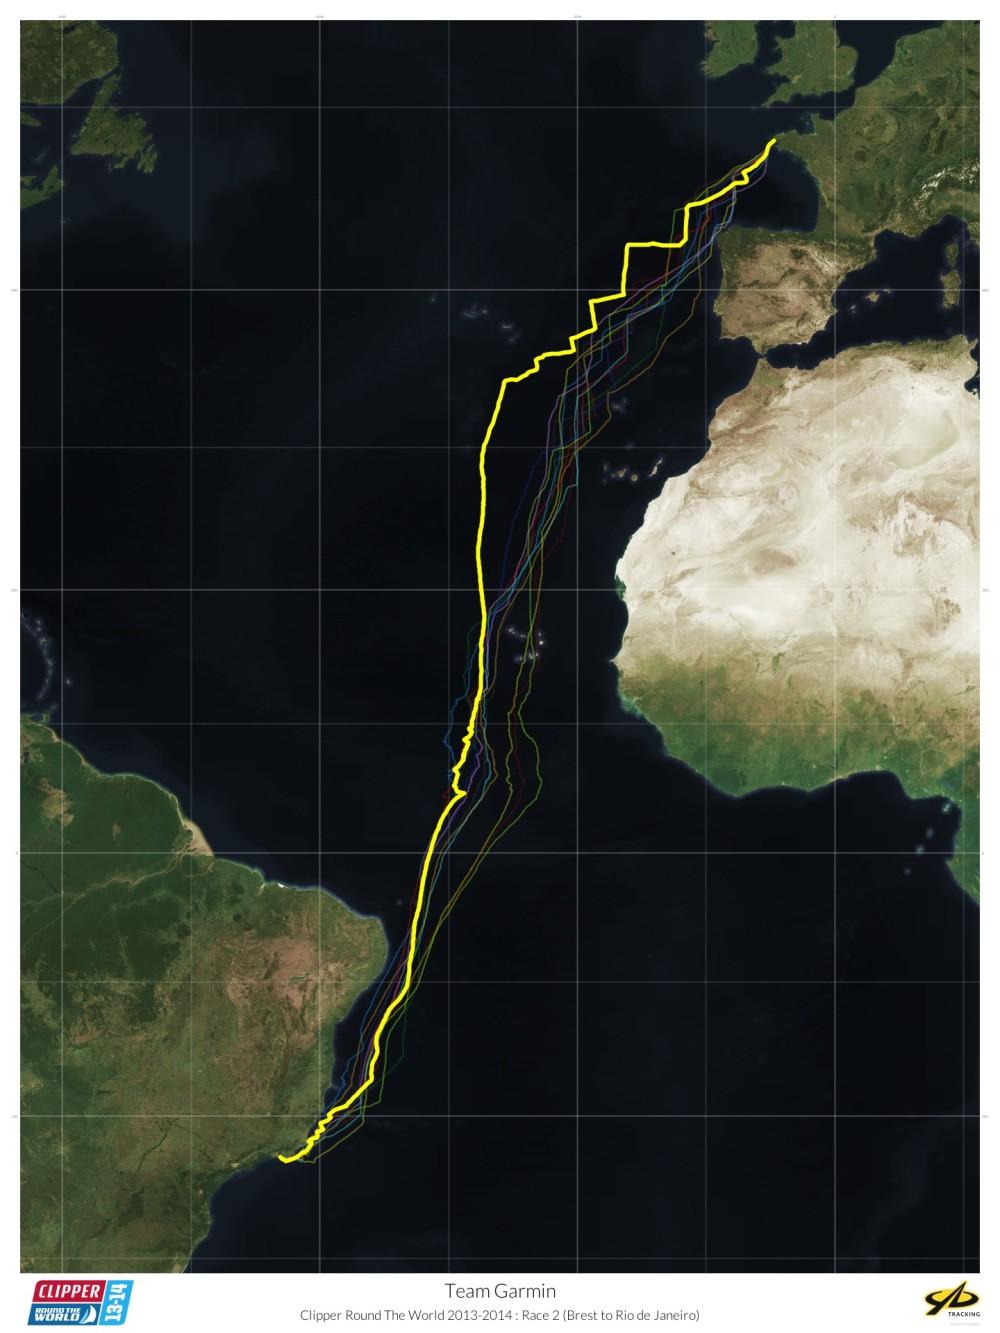 Leg 1 - Brest to Rio